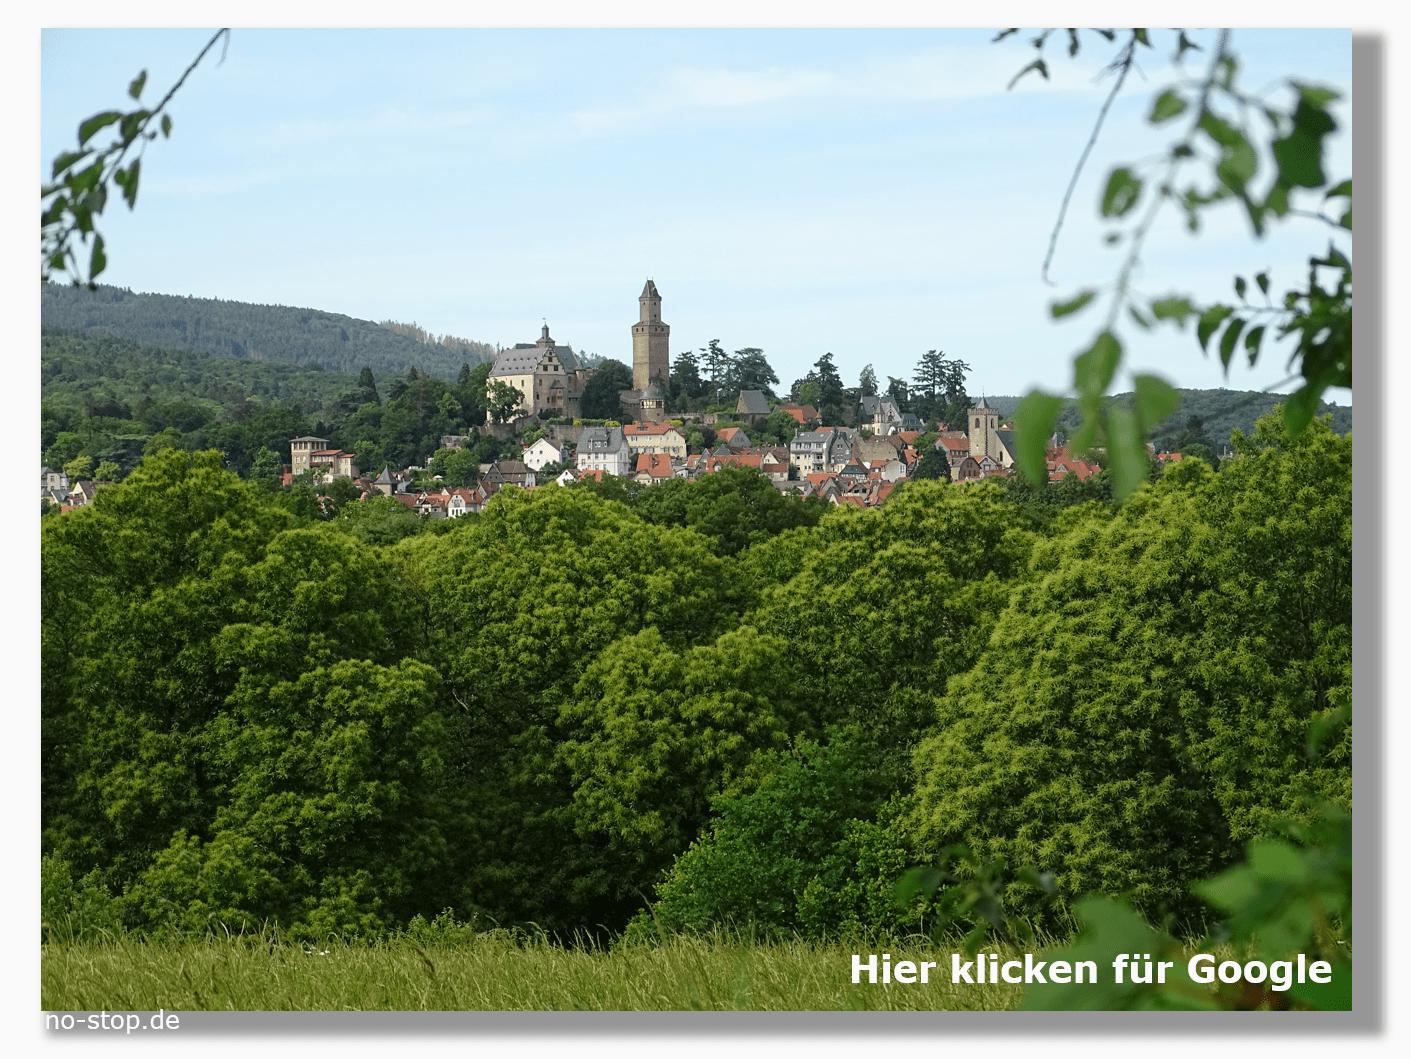 zur Google-Karte mit Standort no-stop.de